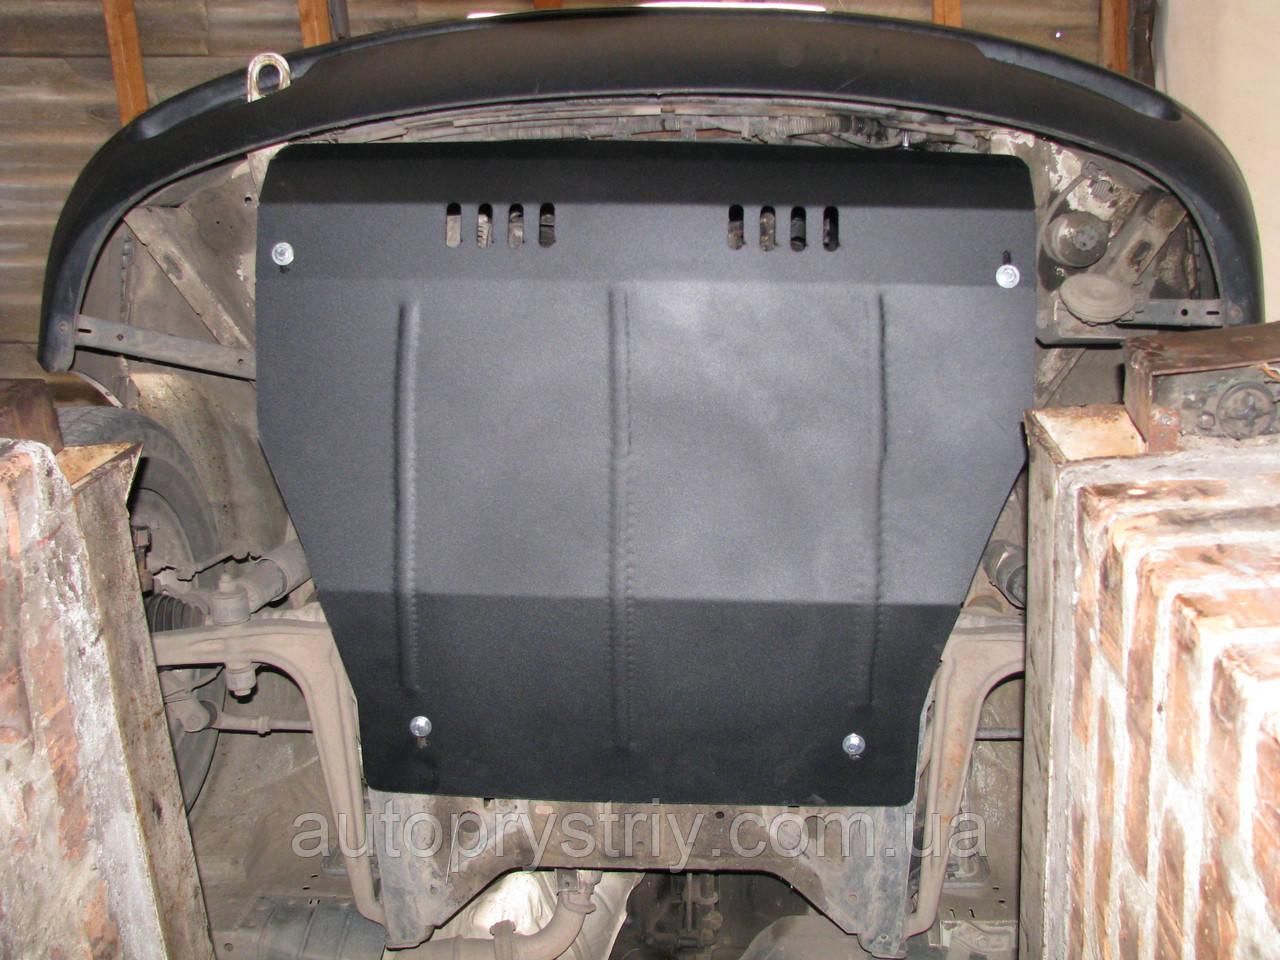 Защита двигателя и КПП Volkswagen Transporter T-4 (Syncro 4x4) (1990-2002) все